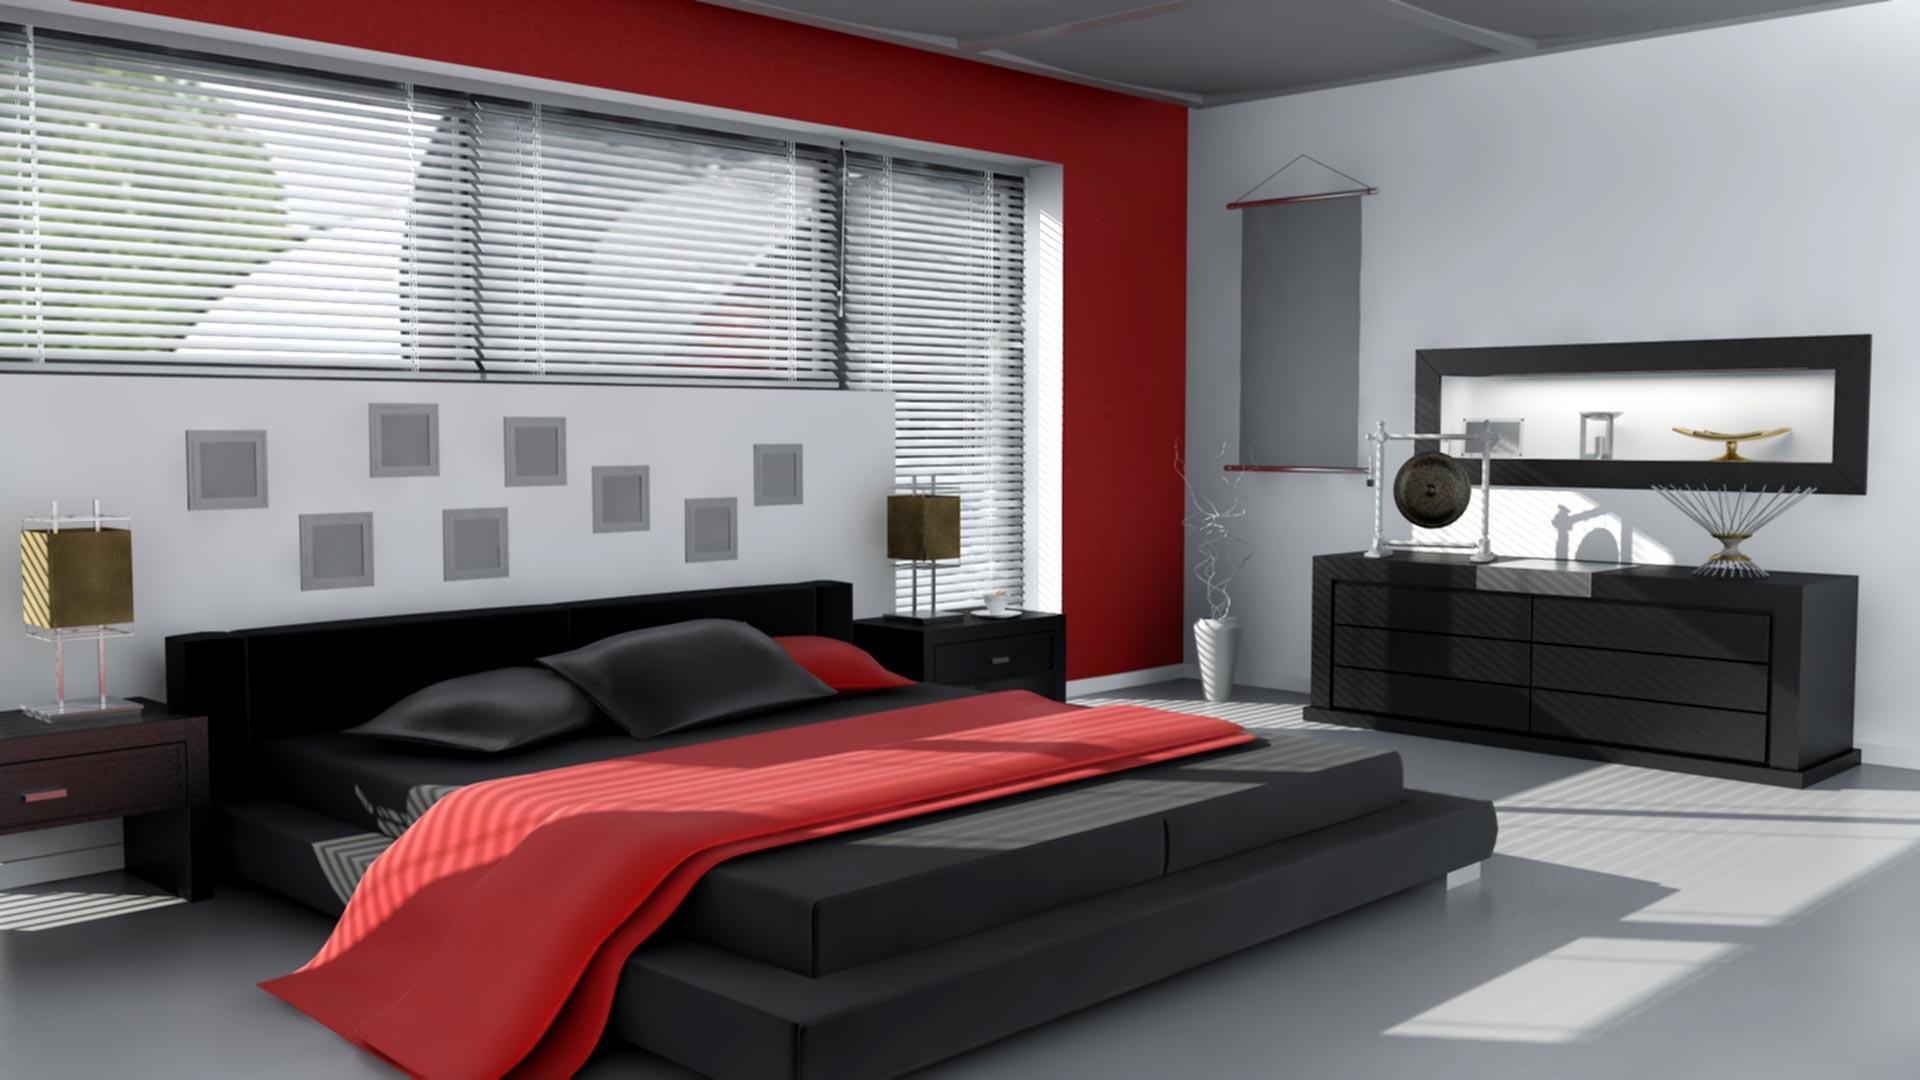 غرف نوم مودرن ديكورات غرف نوم صور غرف نوم 2020 1